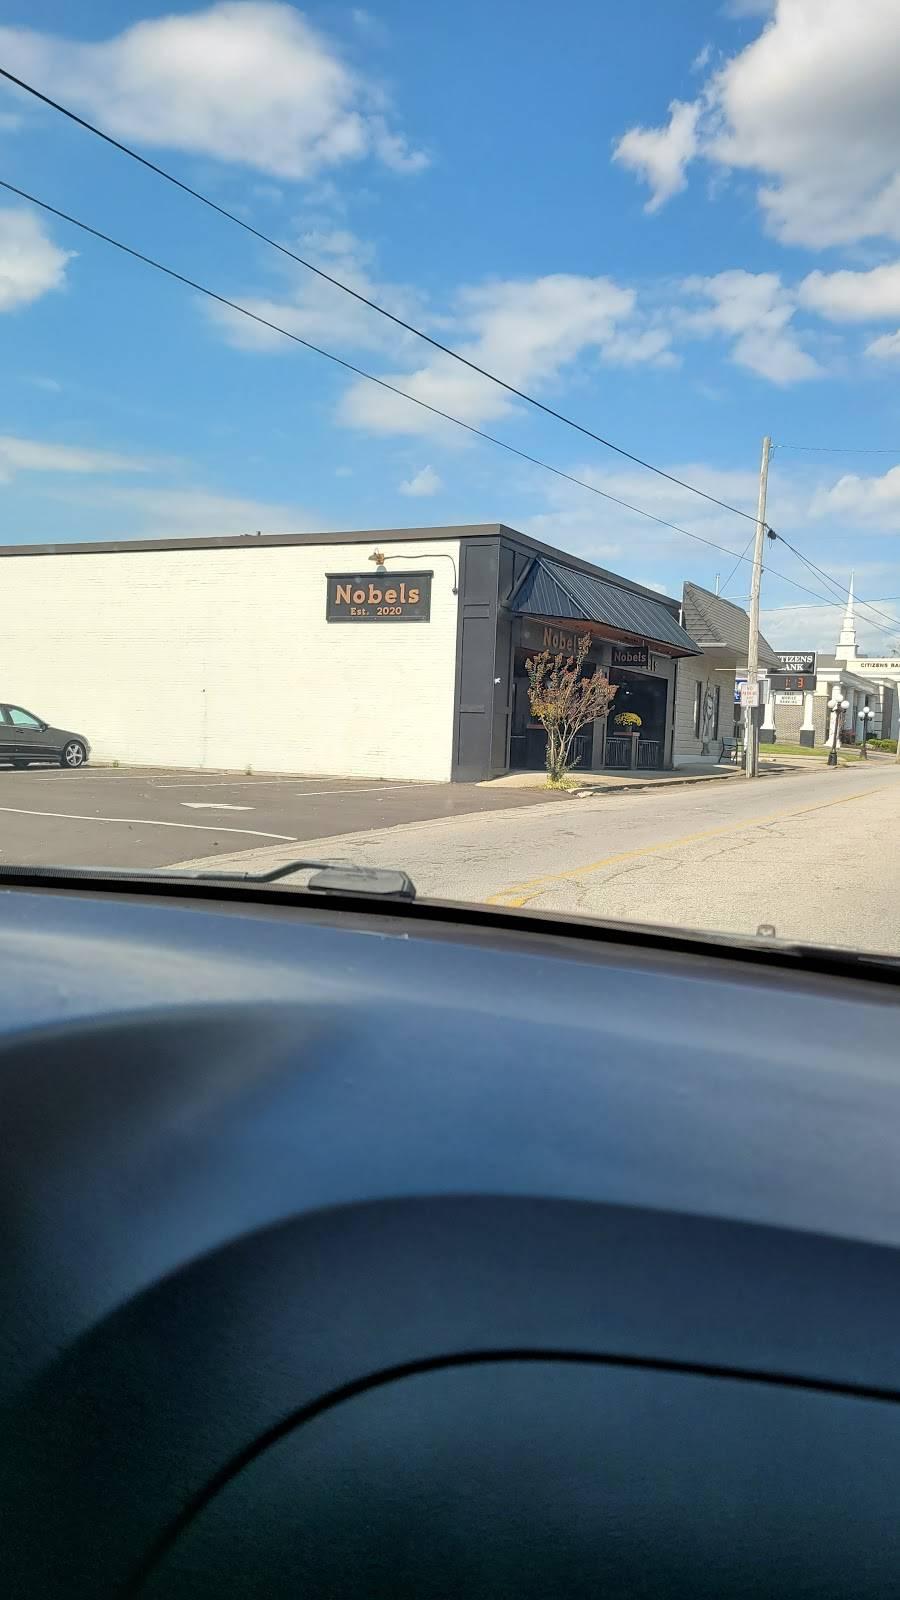 Nobels | restaurant | 323 Main St N, Carthage, TN 37030, USA